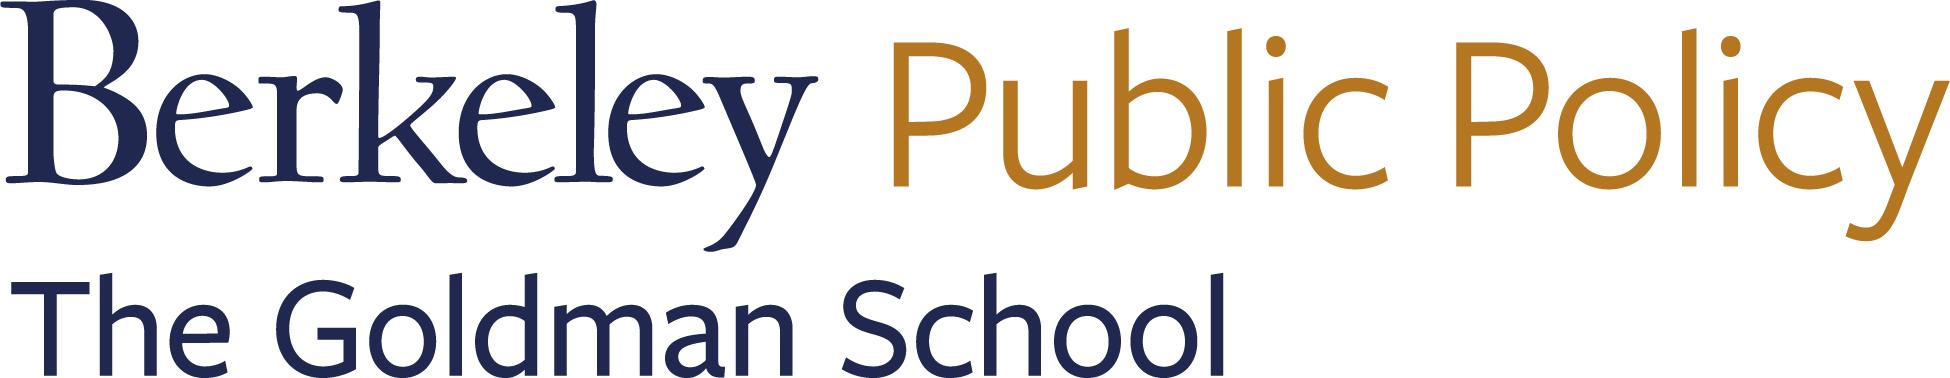 Berkeley Public Policy: Goldman School